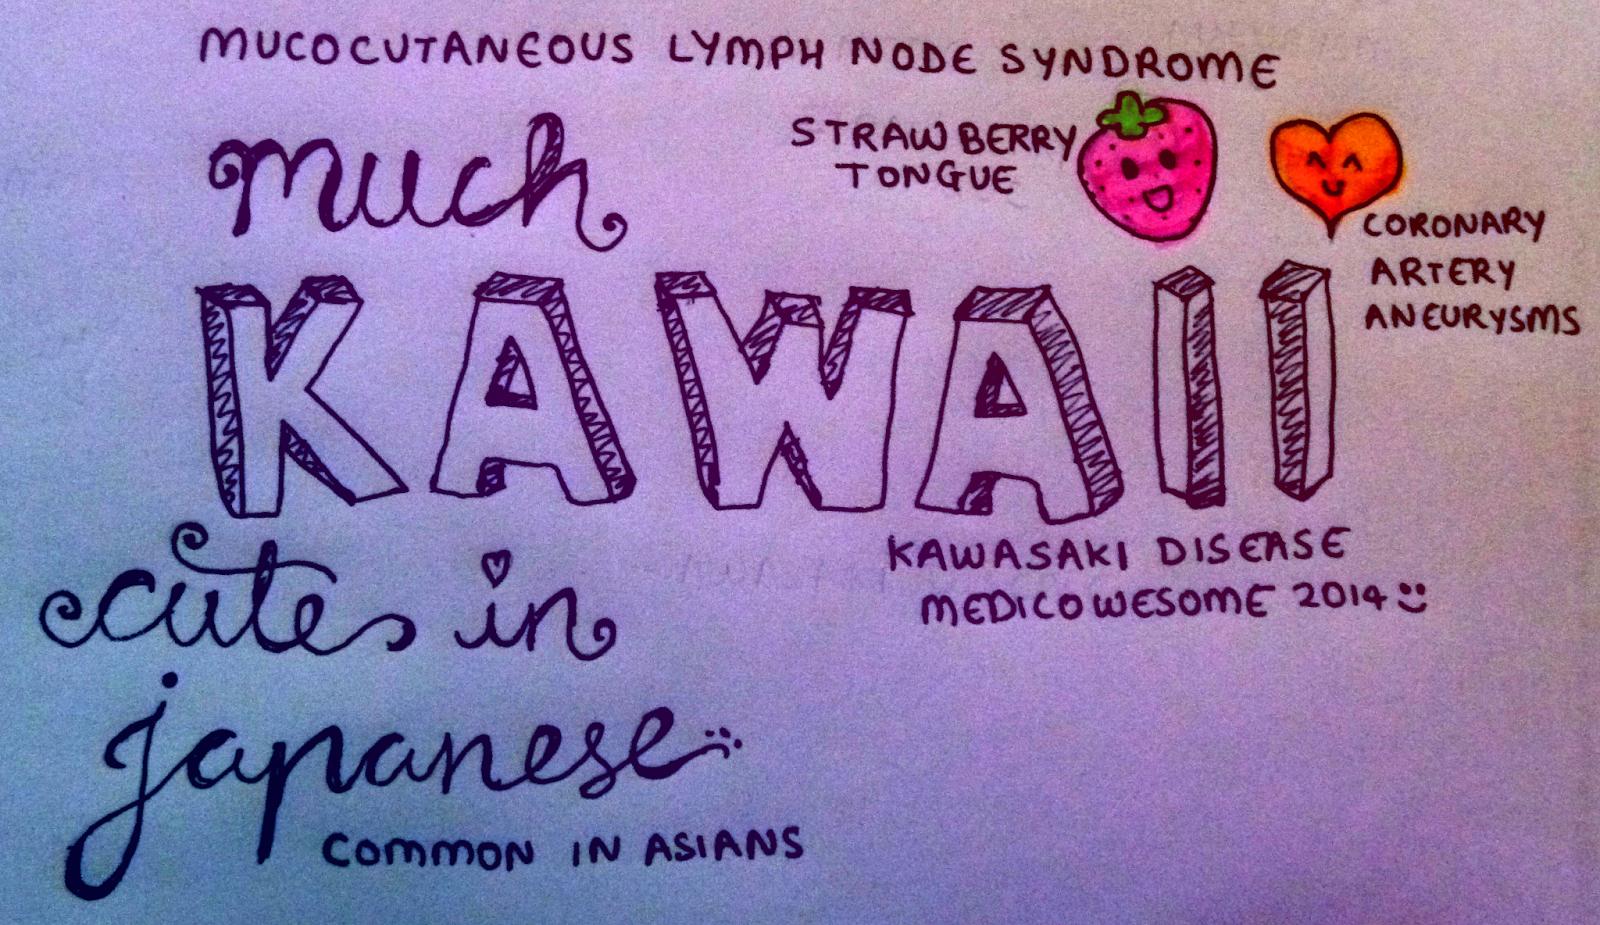 medicowesome: kawasaki disease mnemonic